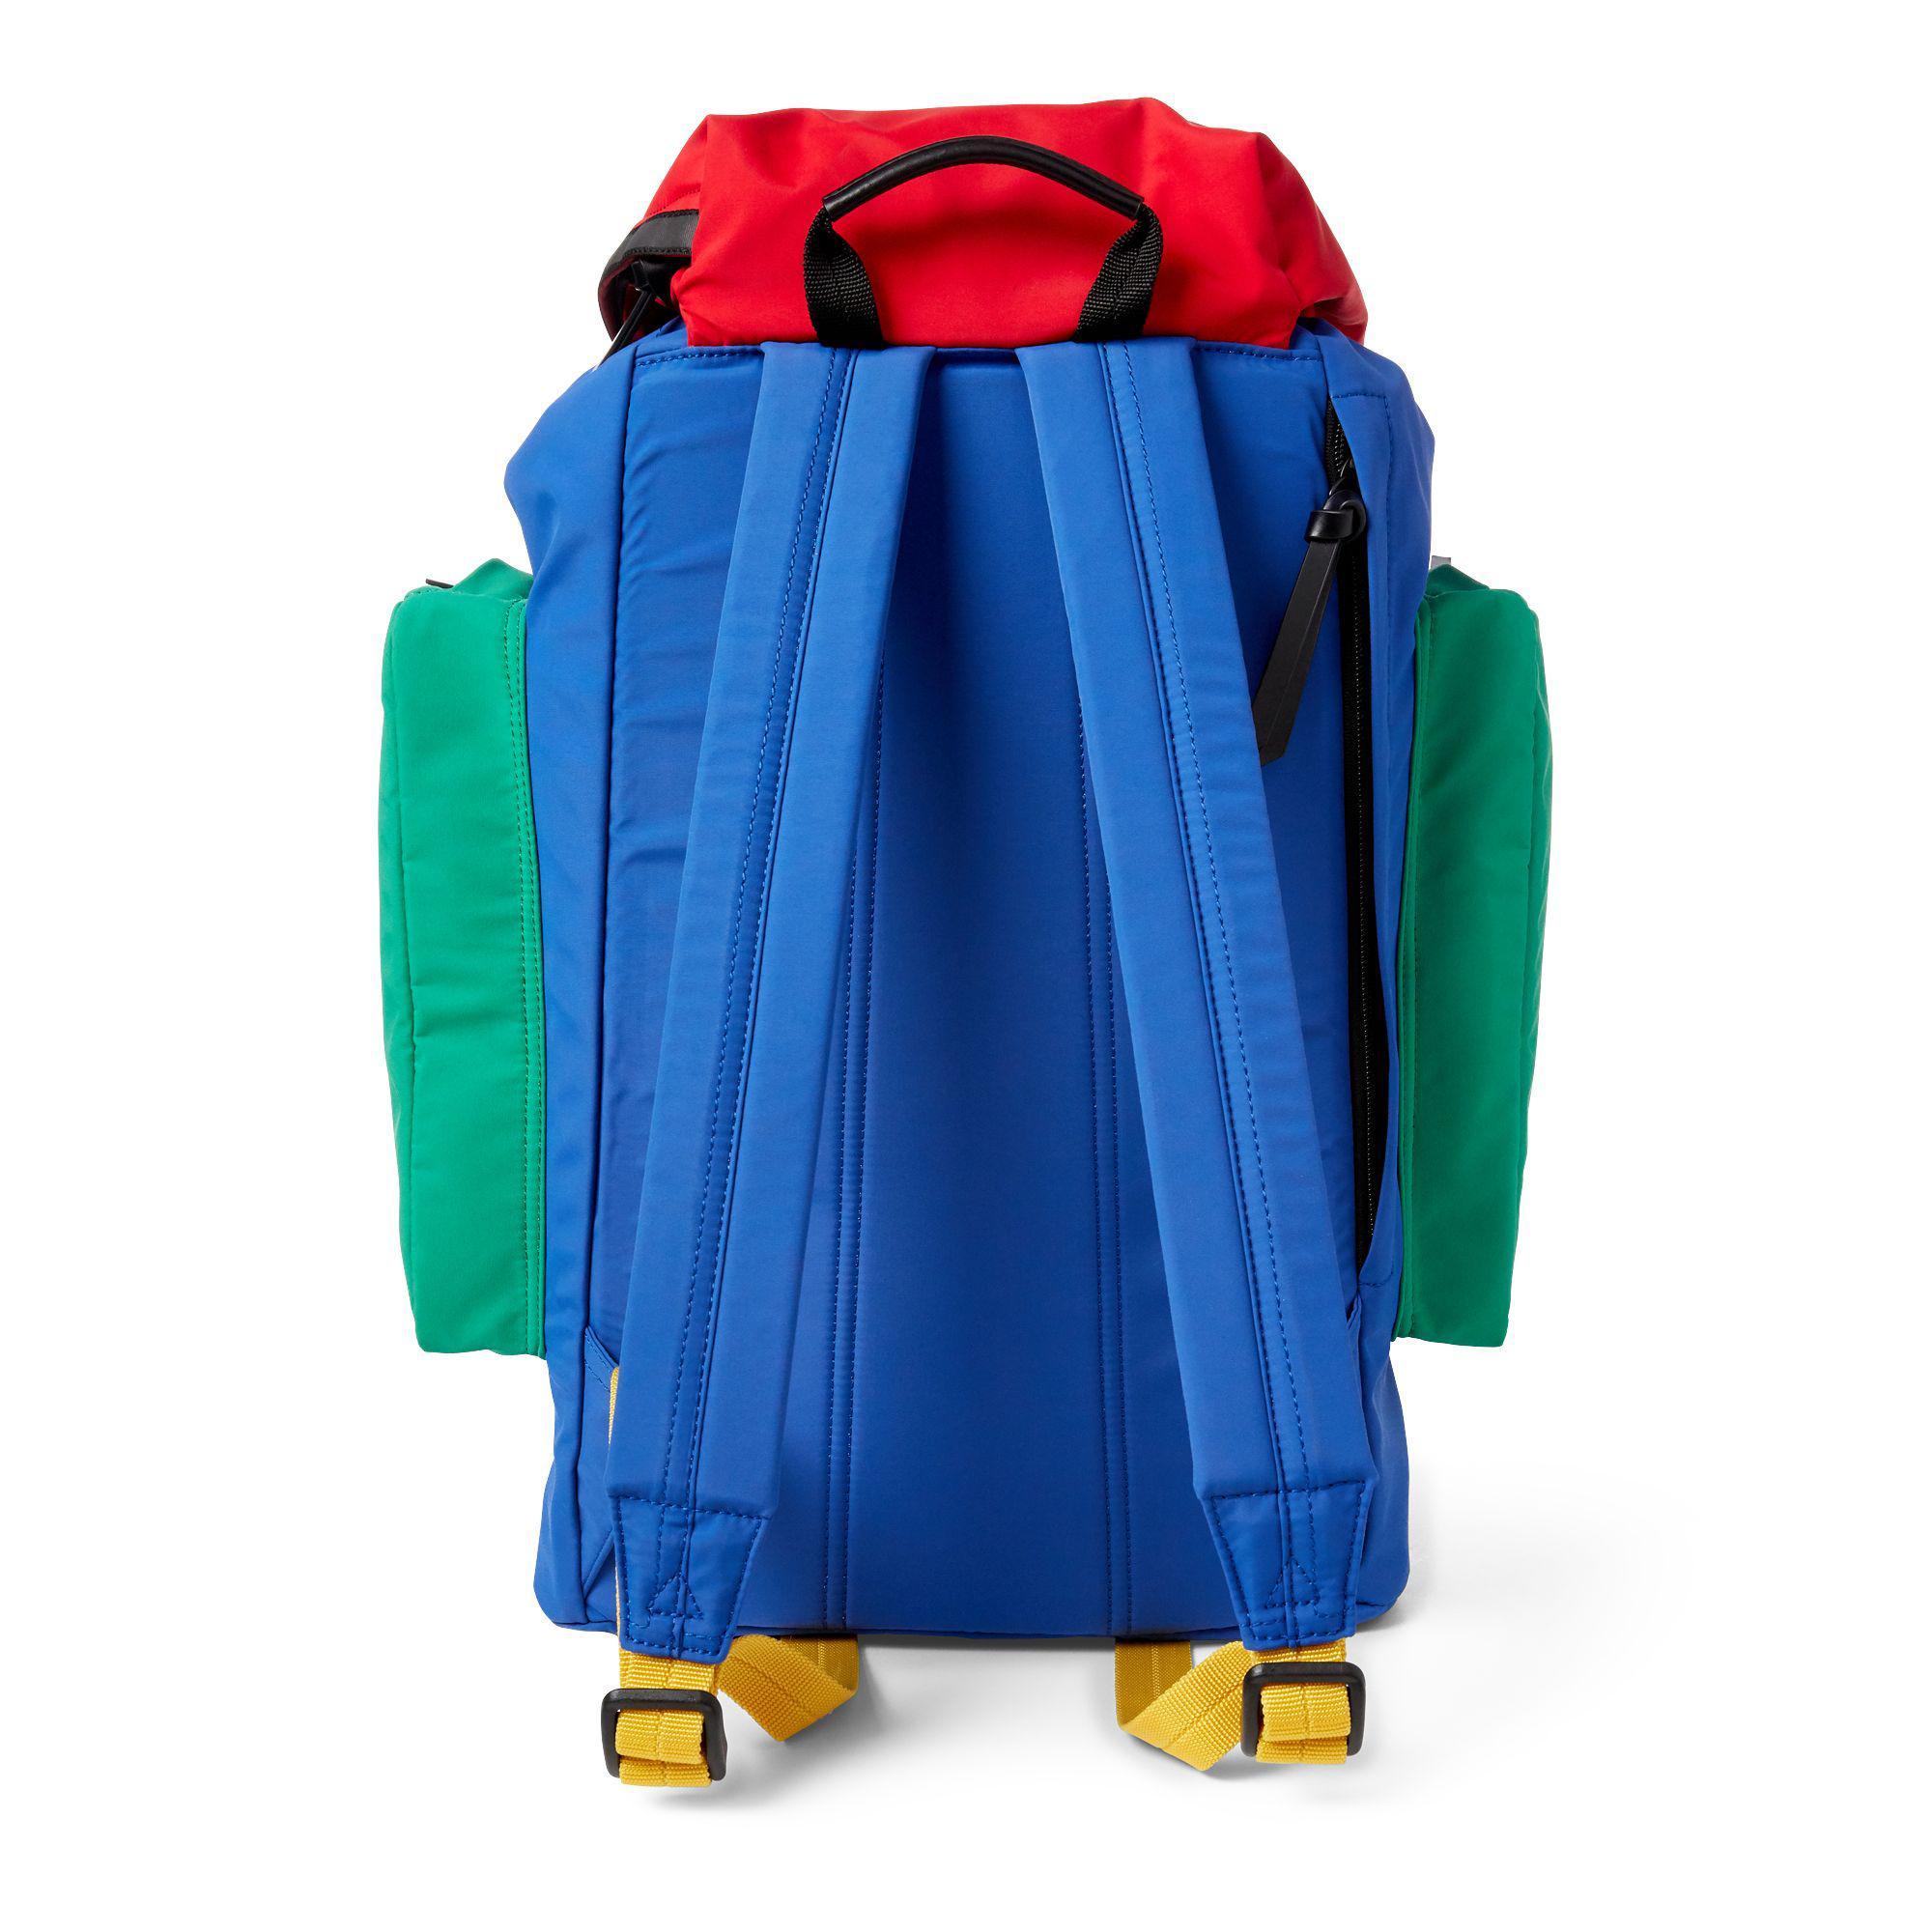 3e52a5560965 Lyst - Polo Ralph Lauren Hi Tech Backpack in Blue for Men